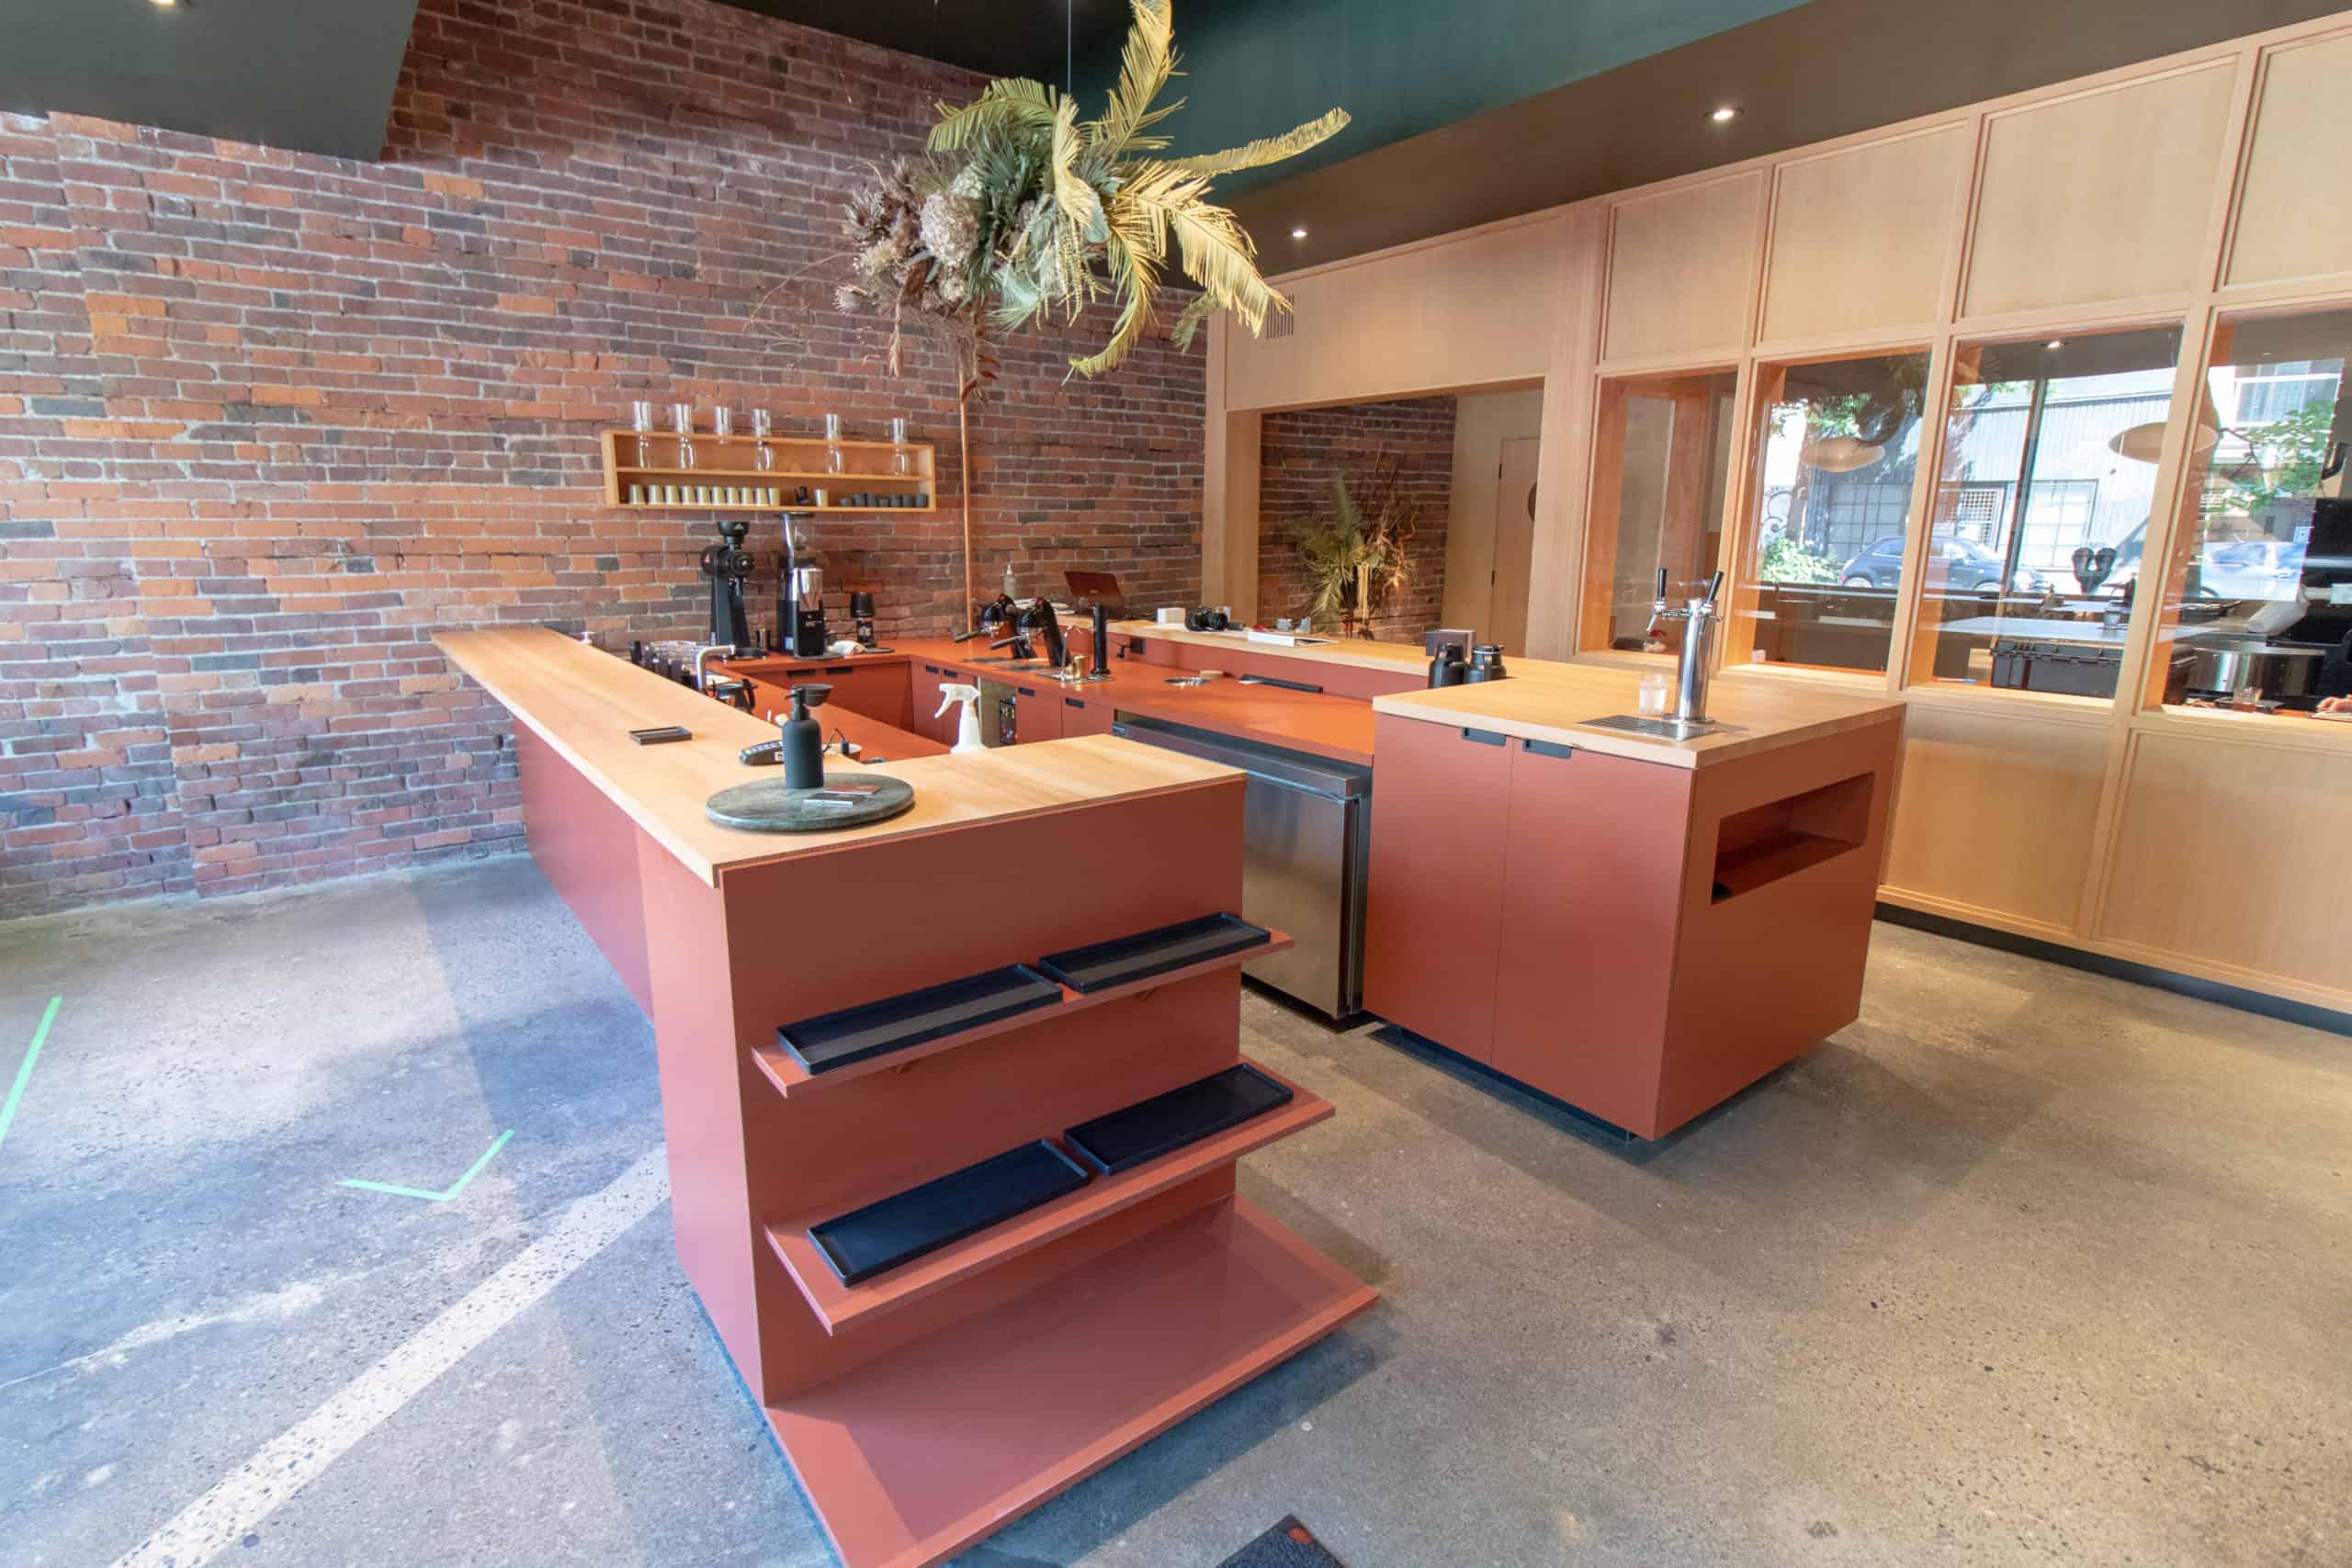 The inside of Harken Cafe